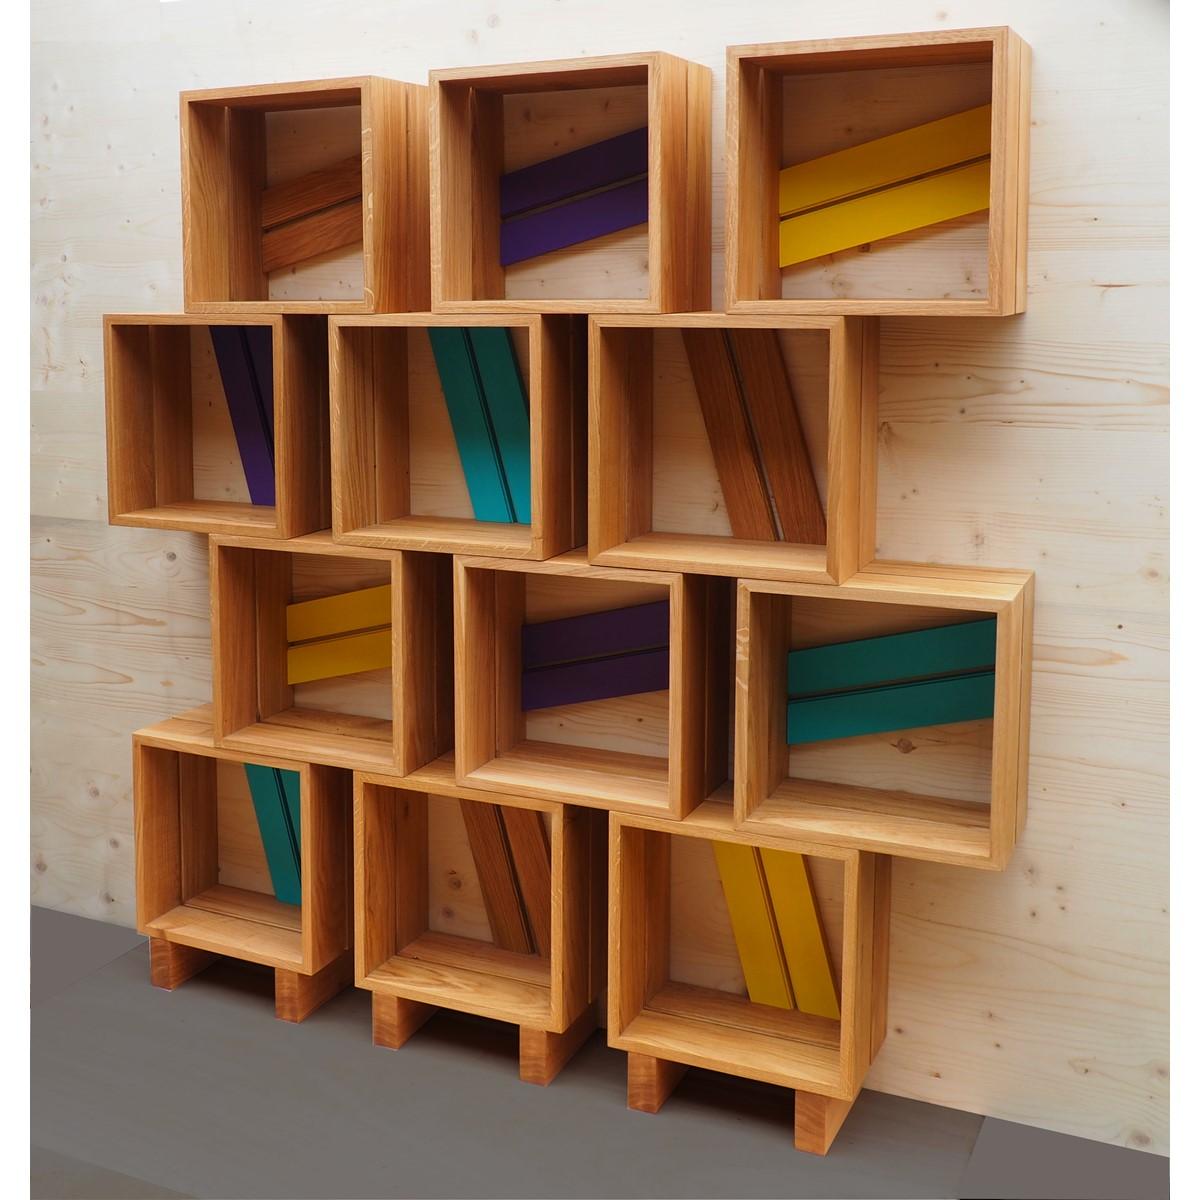 Meuble biblioth que modulable 12 casiers bois jaune violet turquoise atelie - Bibliotheque meuble modulable ...